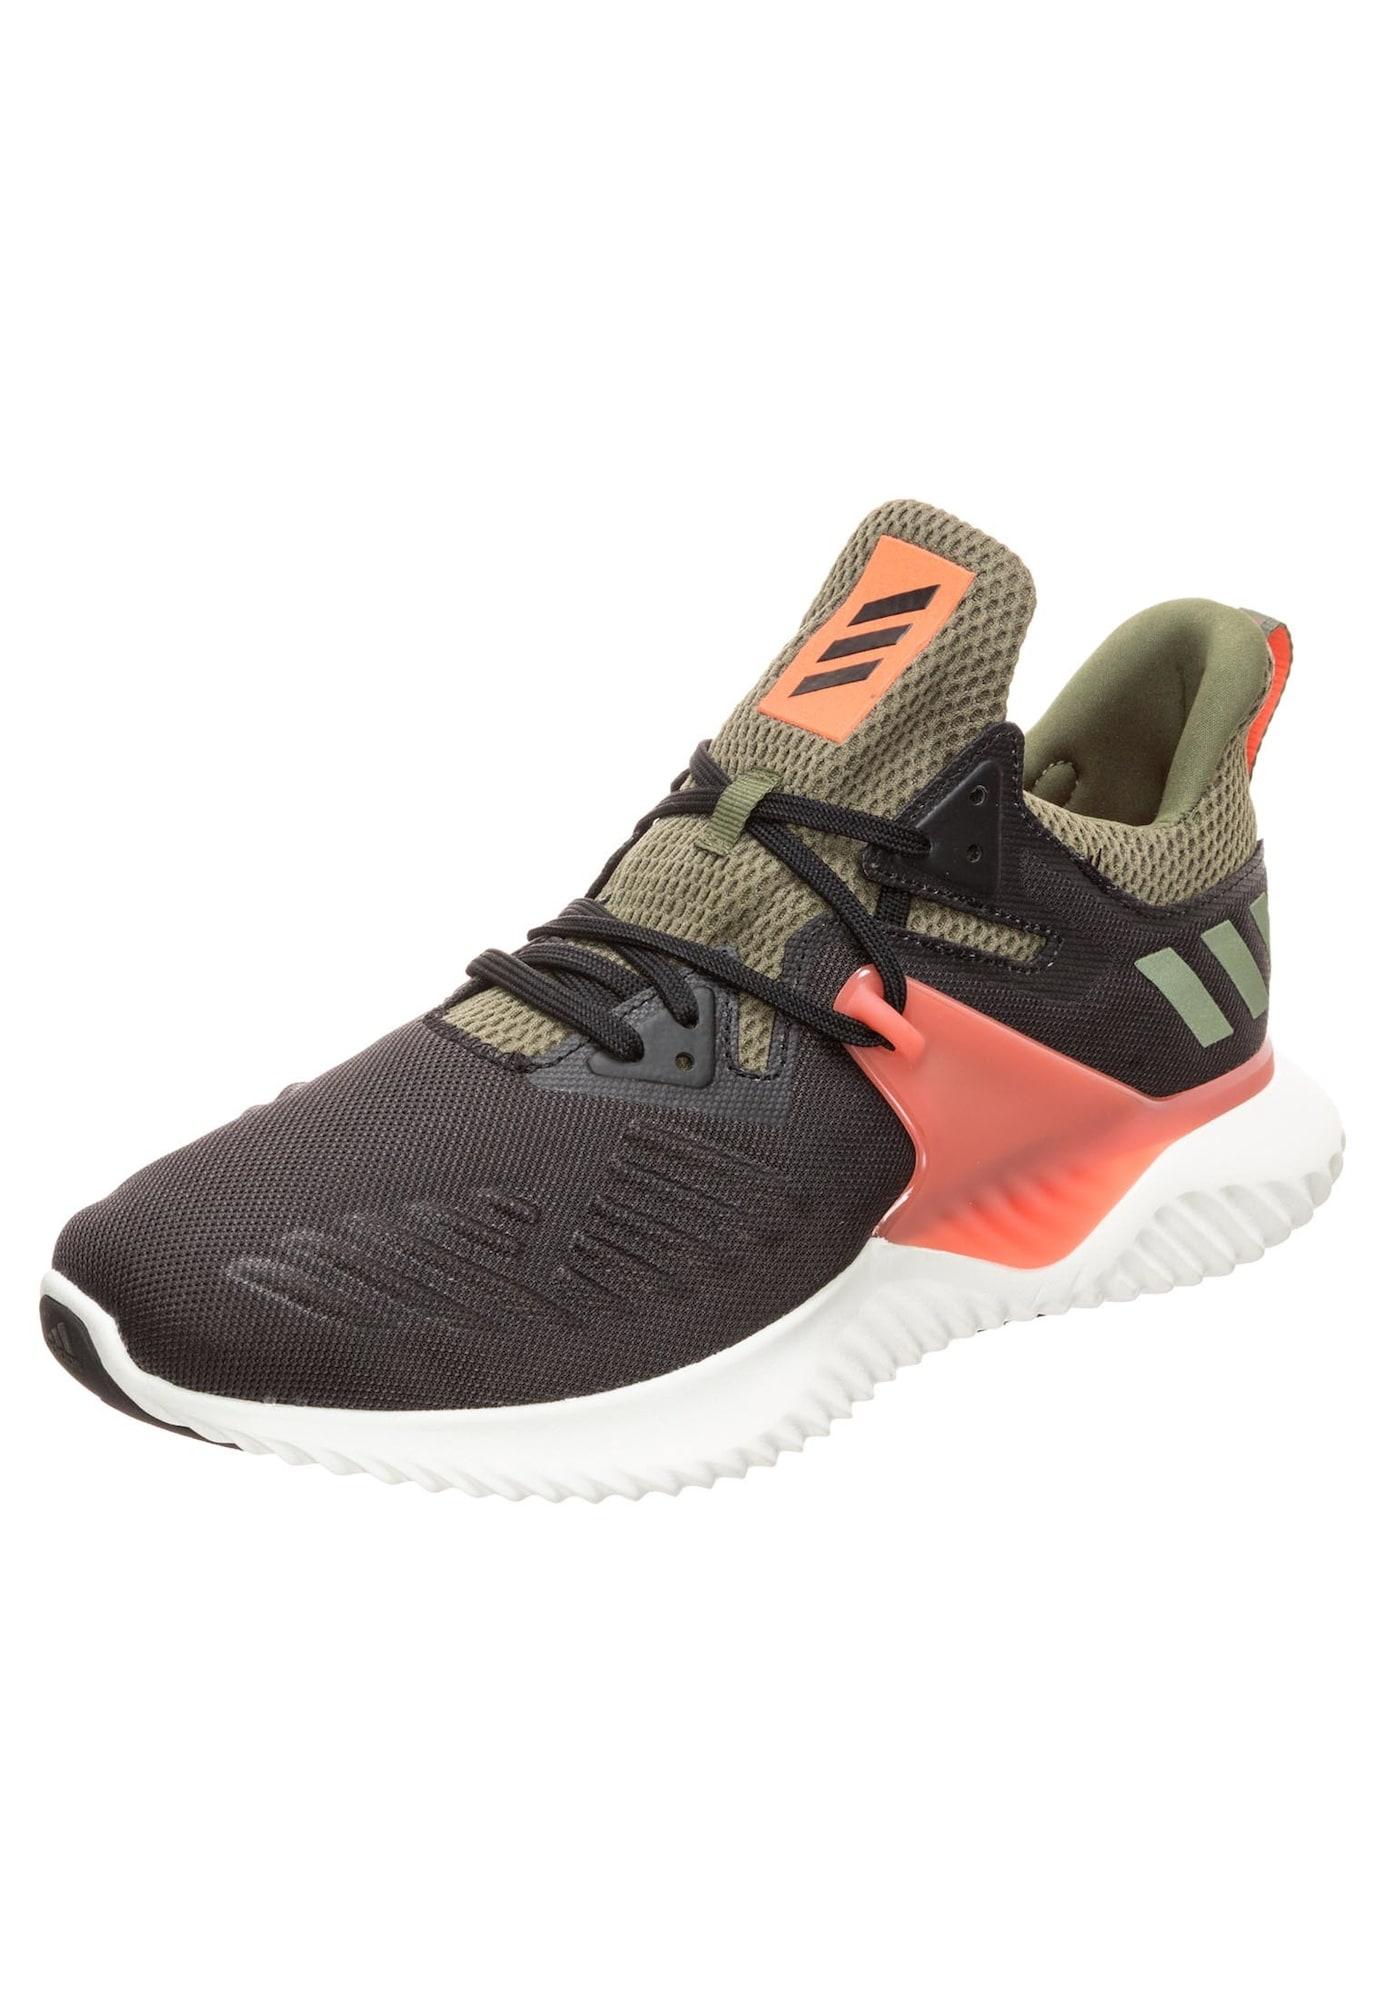 Běžecká obuv Alphabounce Beyond khaki oranžová černá ADIDAS PERFORMANCE